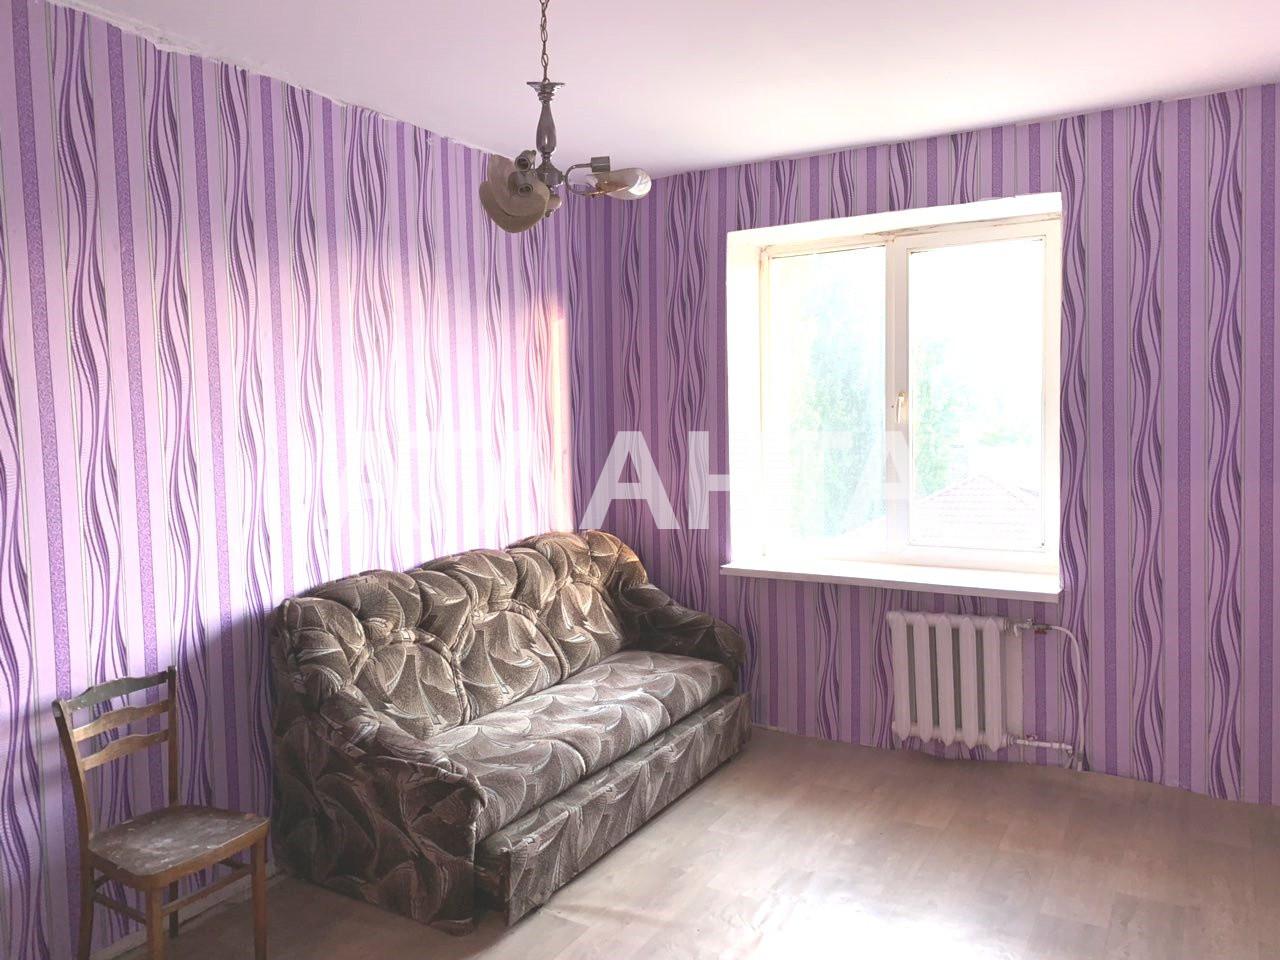 Продается 2-комнатная Квартира на ул. Запорожская — 50 000 у.е. (фото №4)